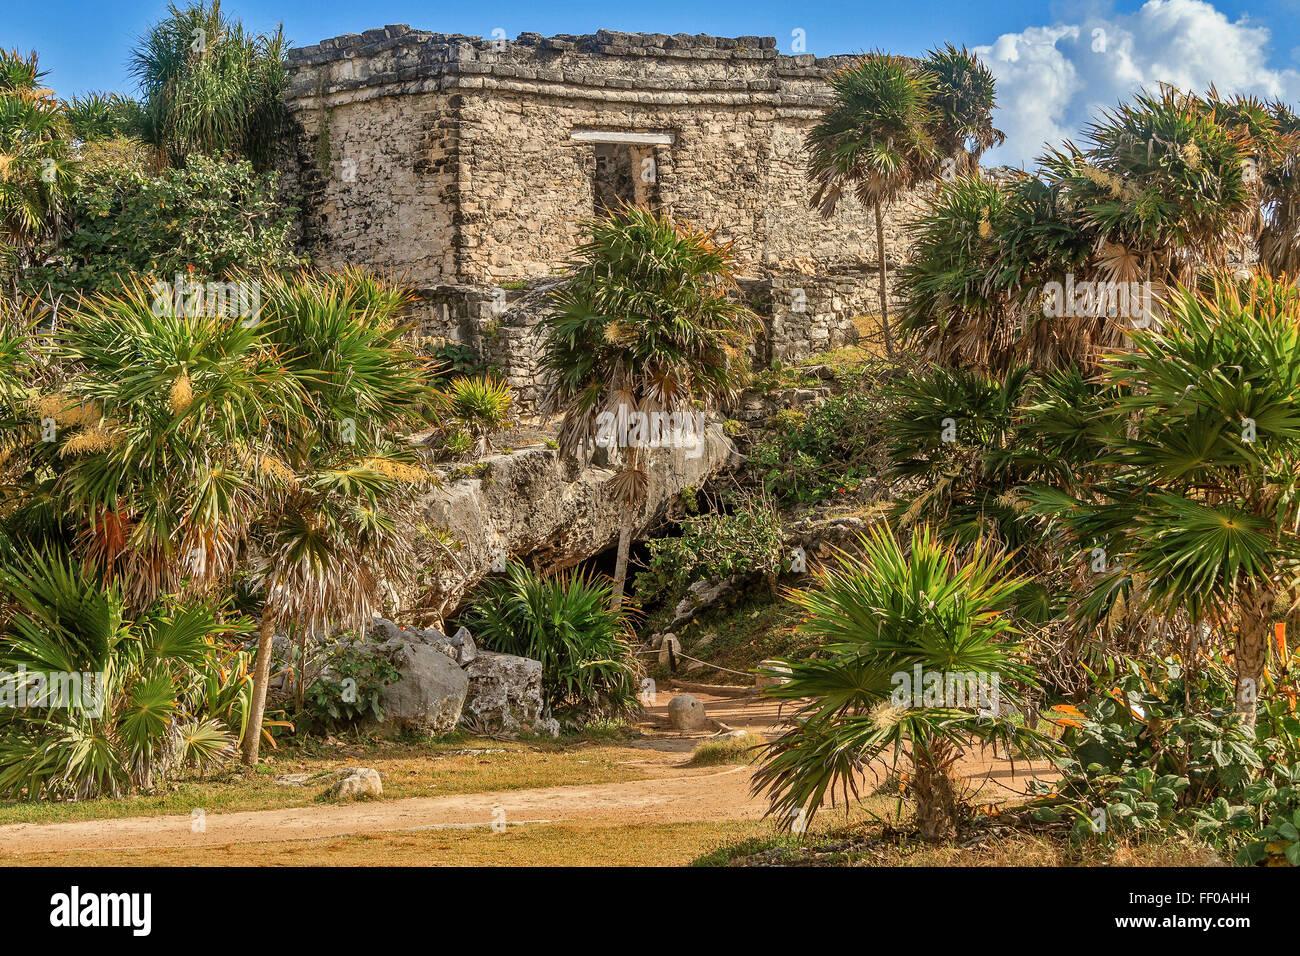 Building At Tulum Yucatan Mexico - Stock Image